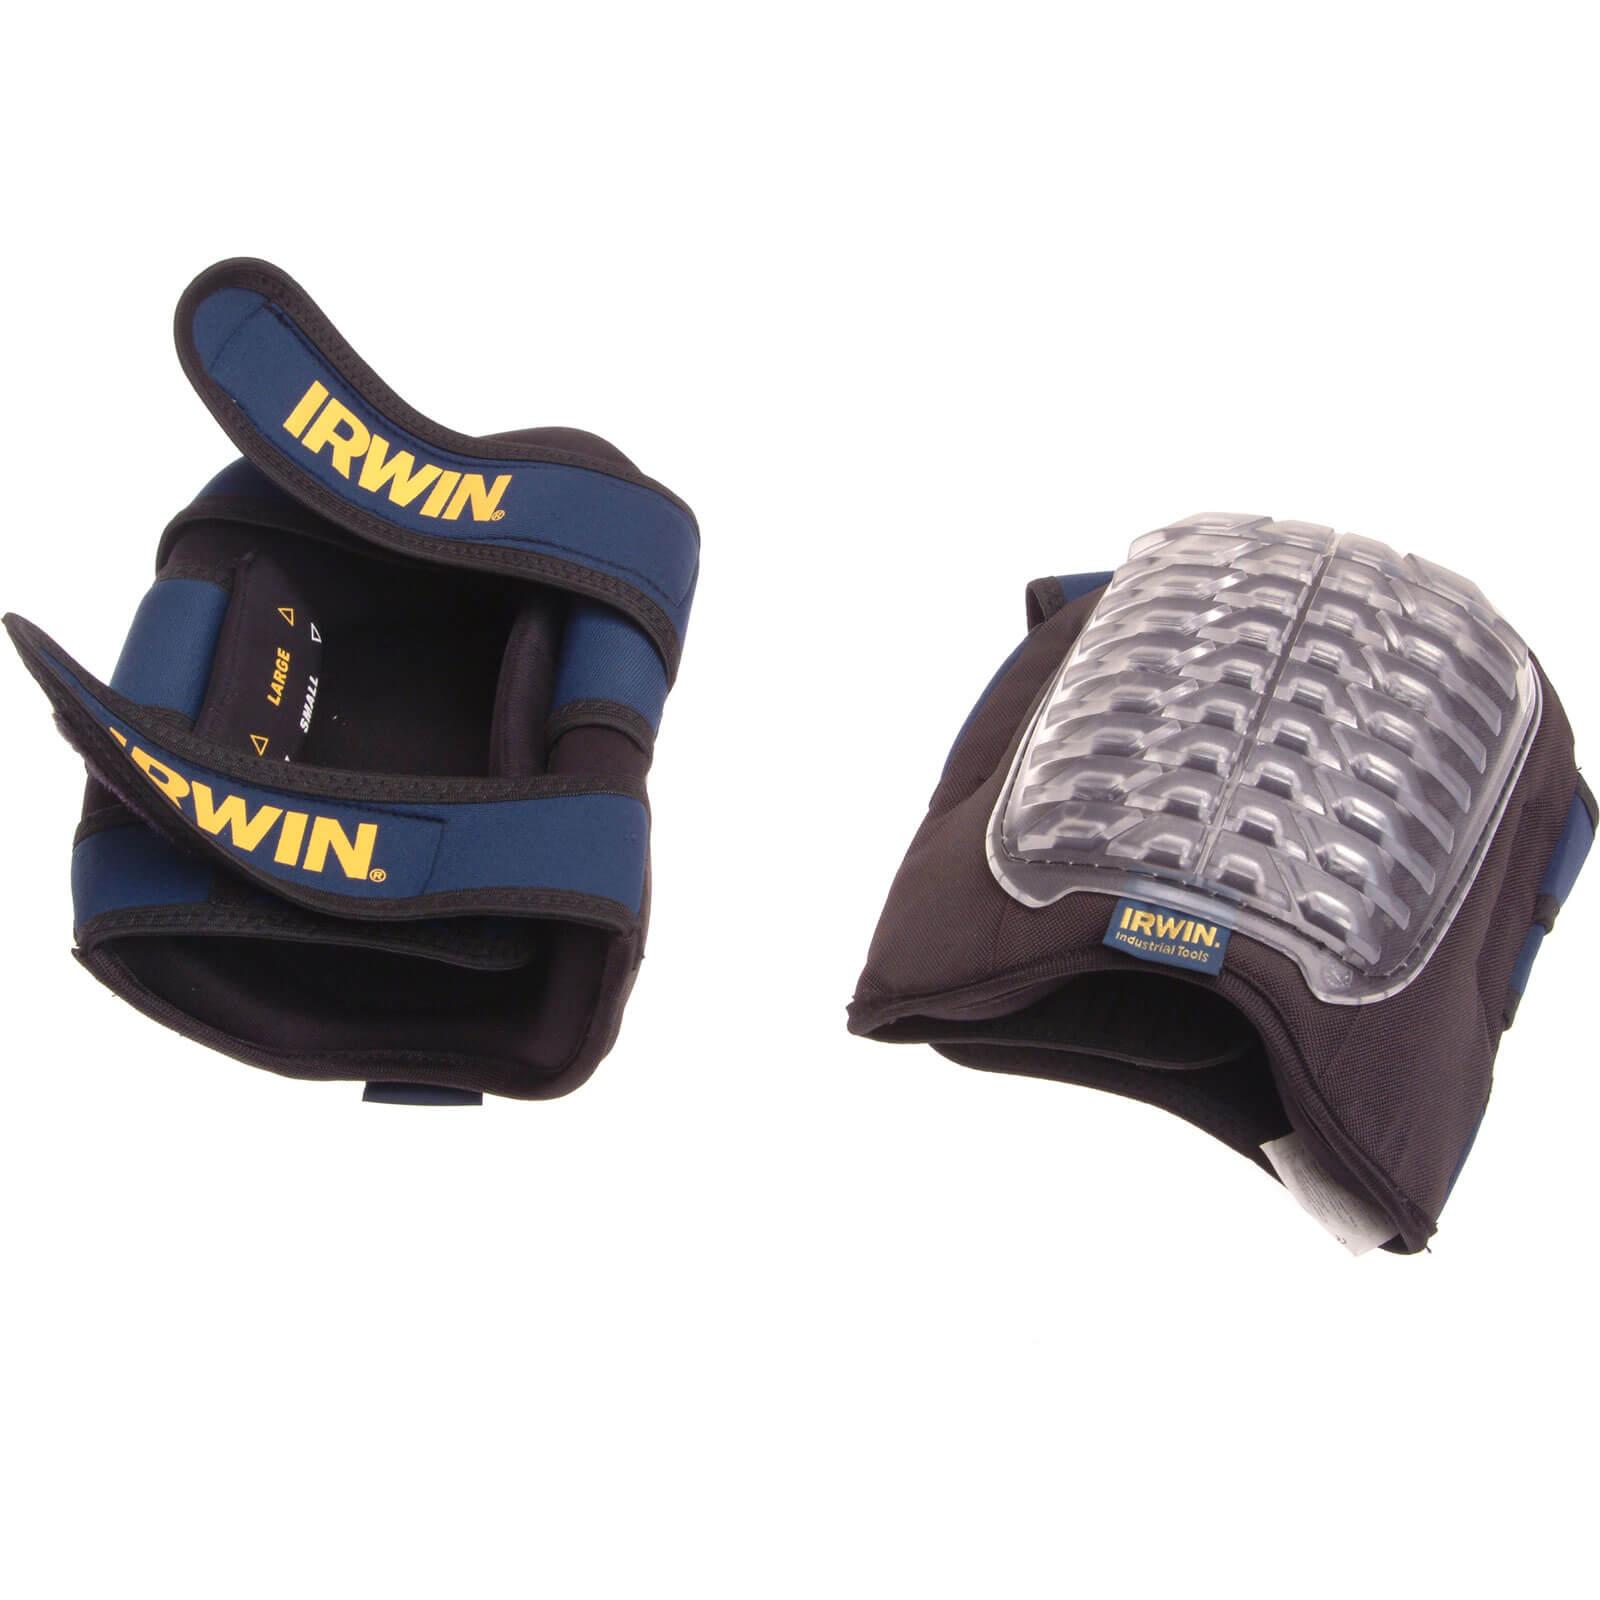 Irwin Professional Non Marring Gel Knee Pads